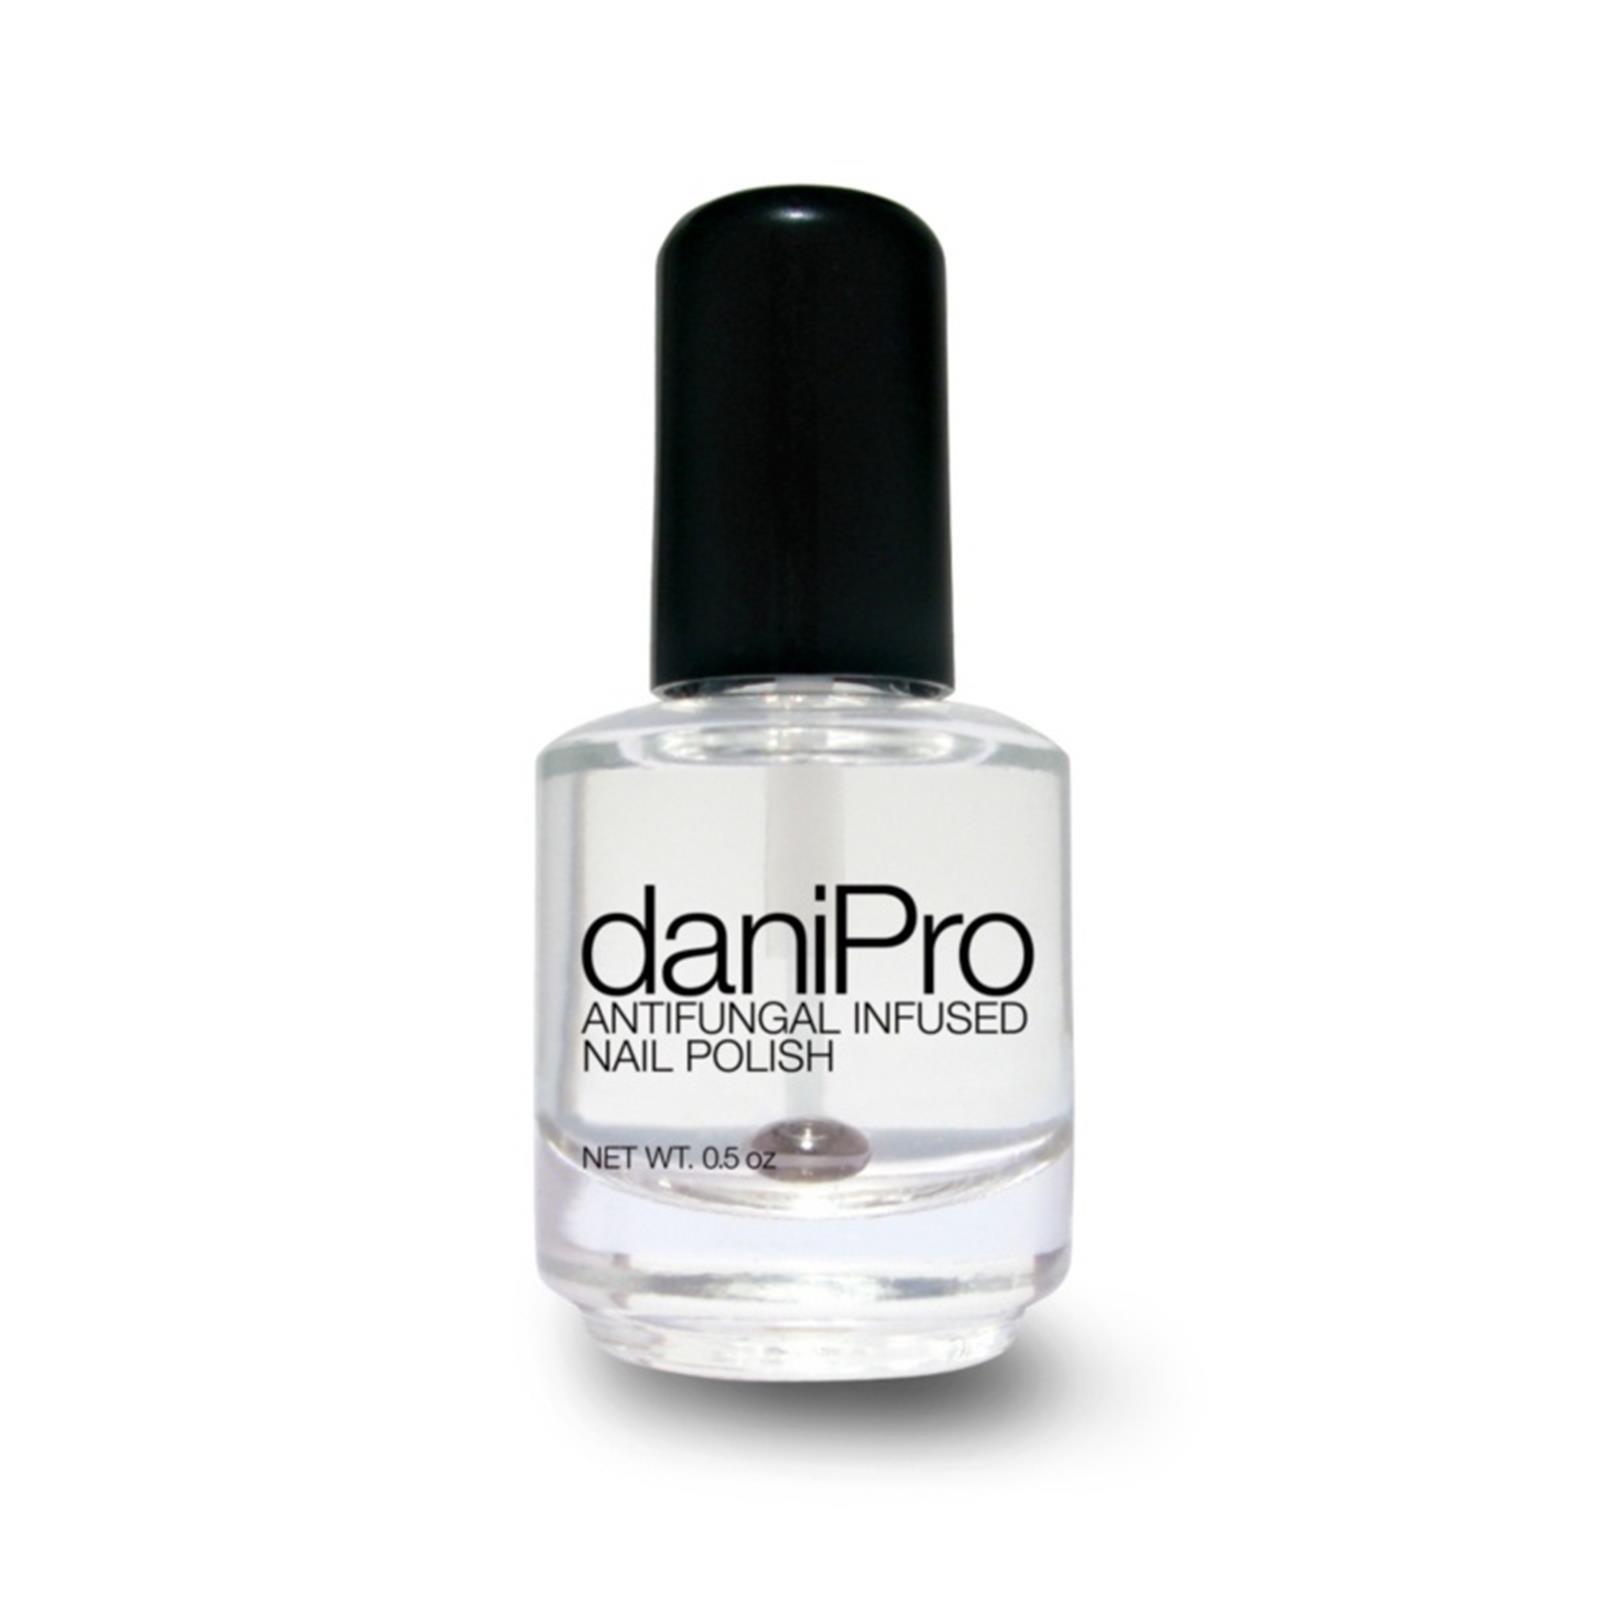 Pink Nail Polish Top Coat: Amazon.com: DaniPro Infused With Undecylenic Acid Nail